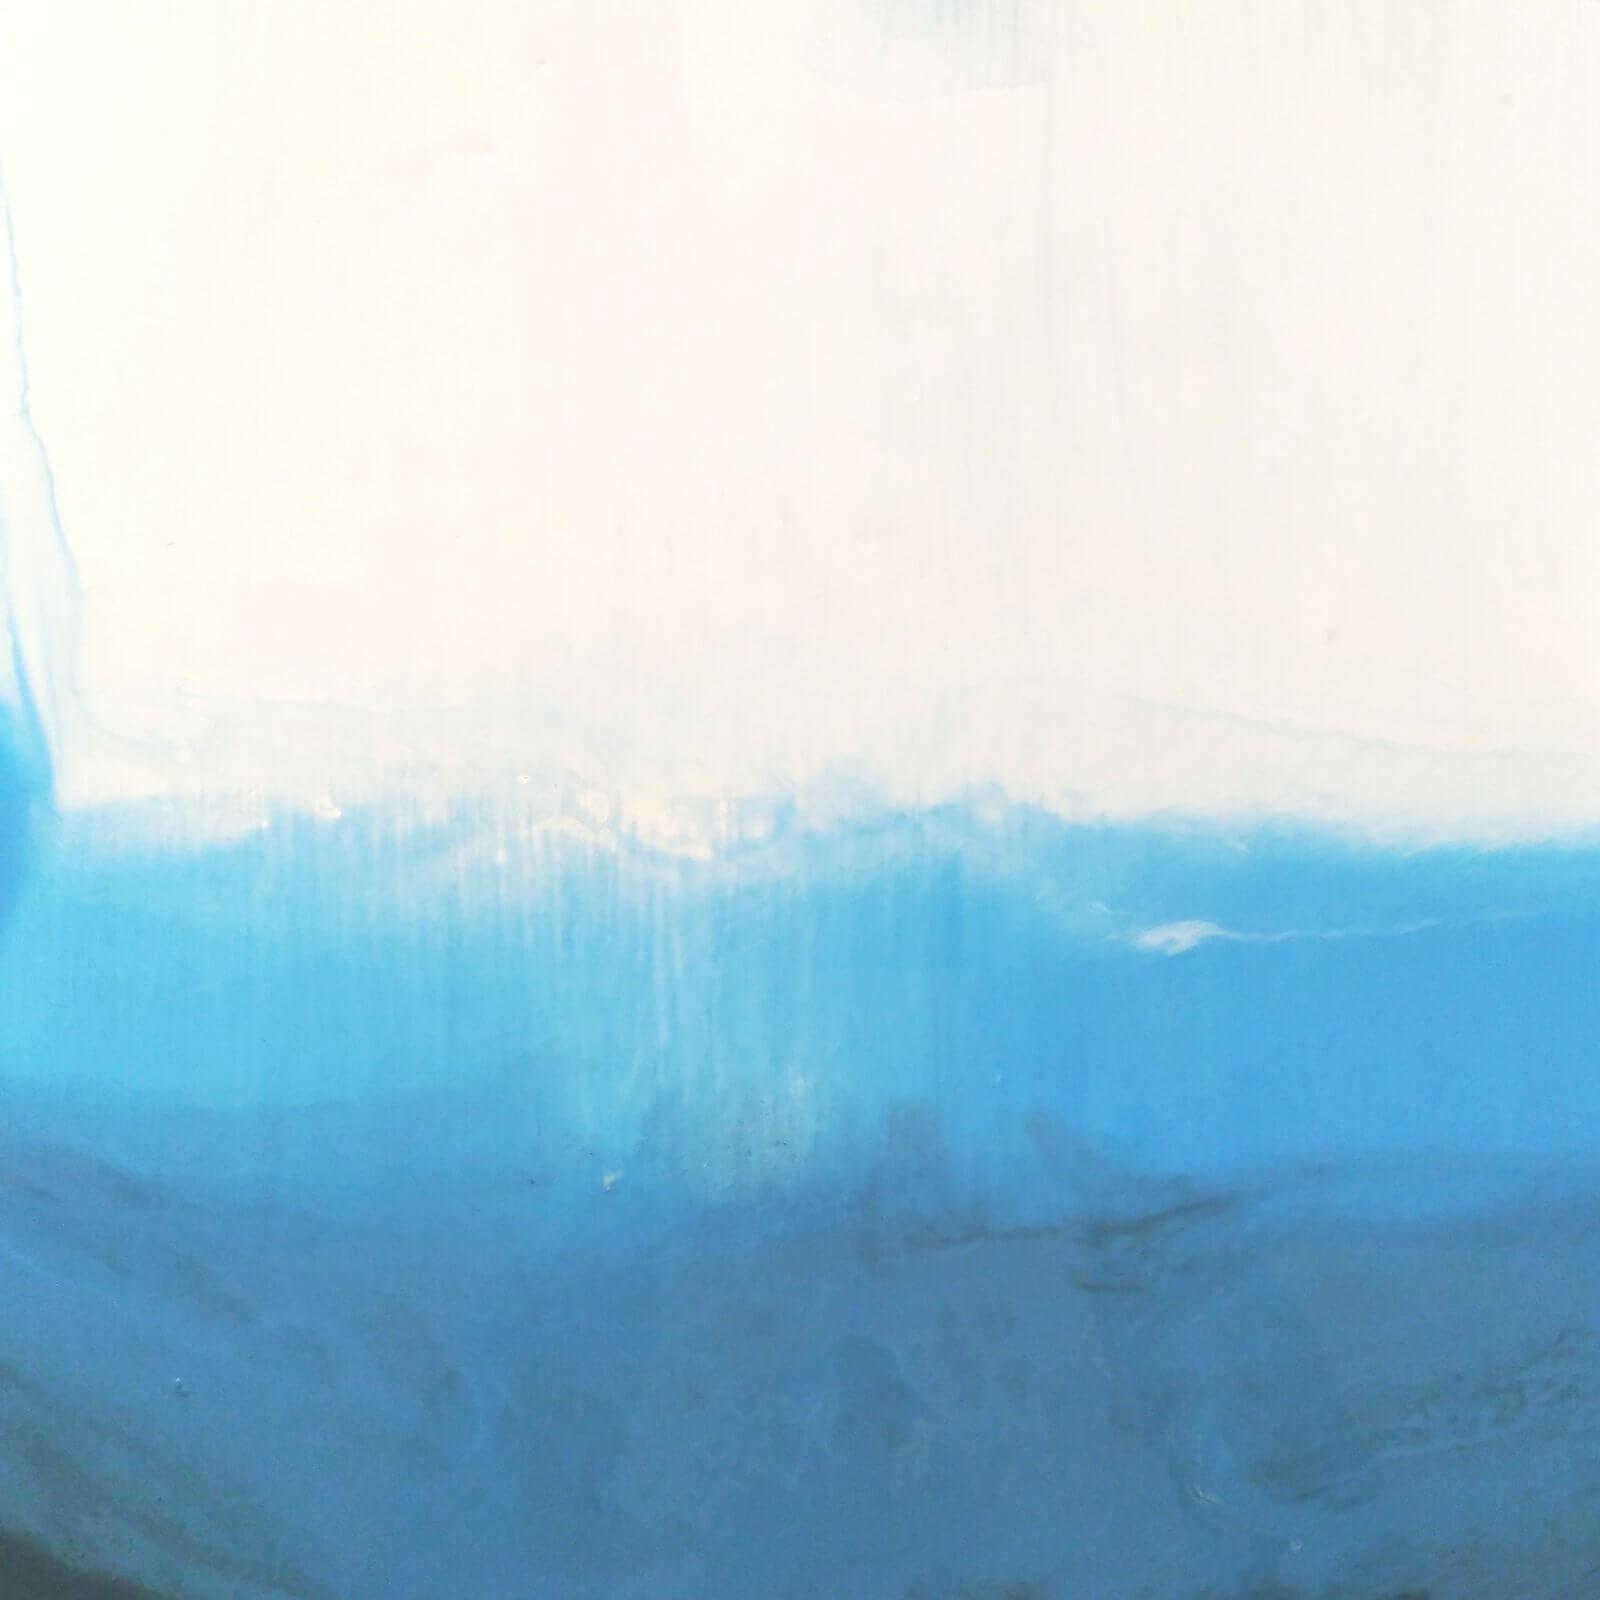 daniel-schuh-malerei-maritim-water-blue-white